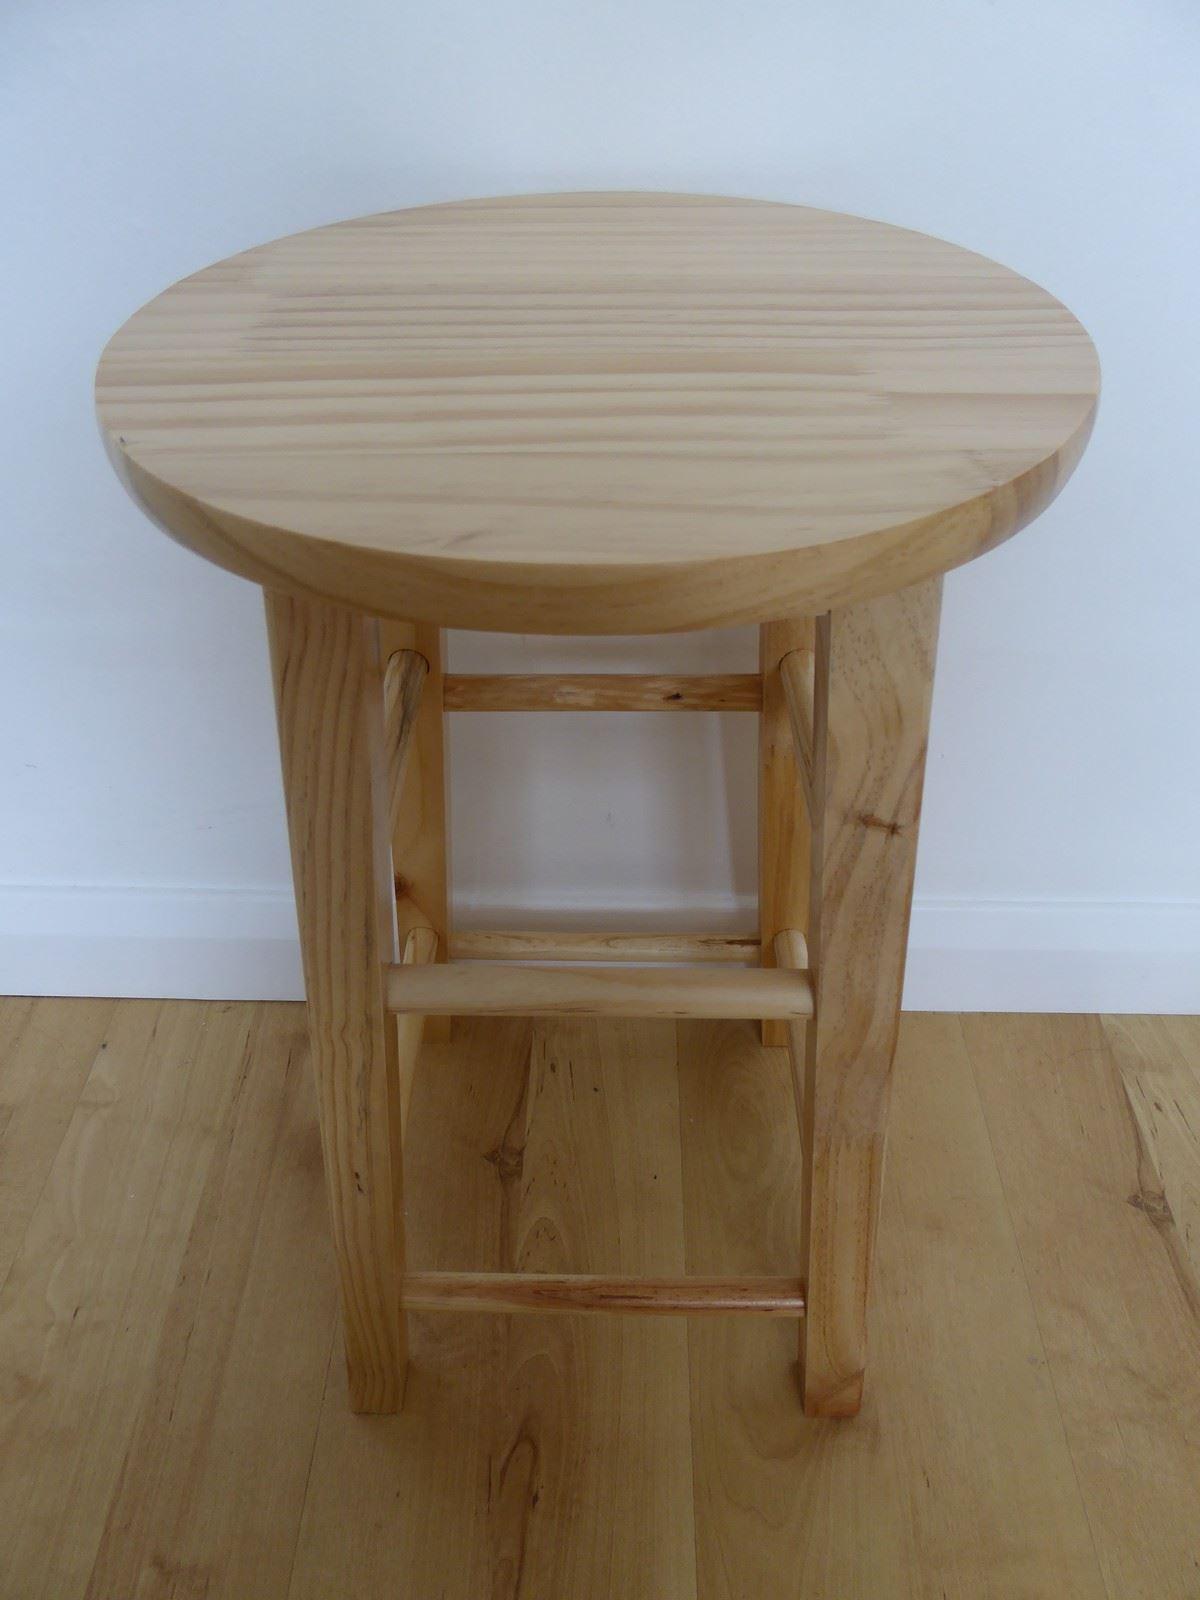 1 Seater 2 Seater Breakfast Bar Set Folding Table Stools